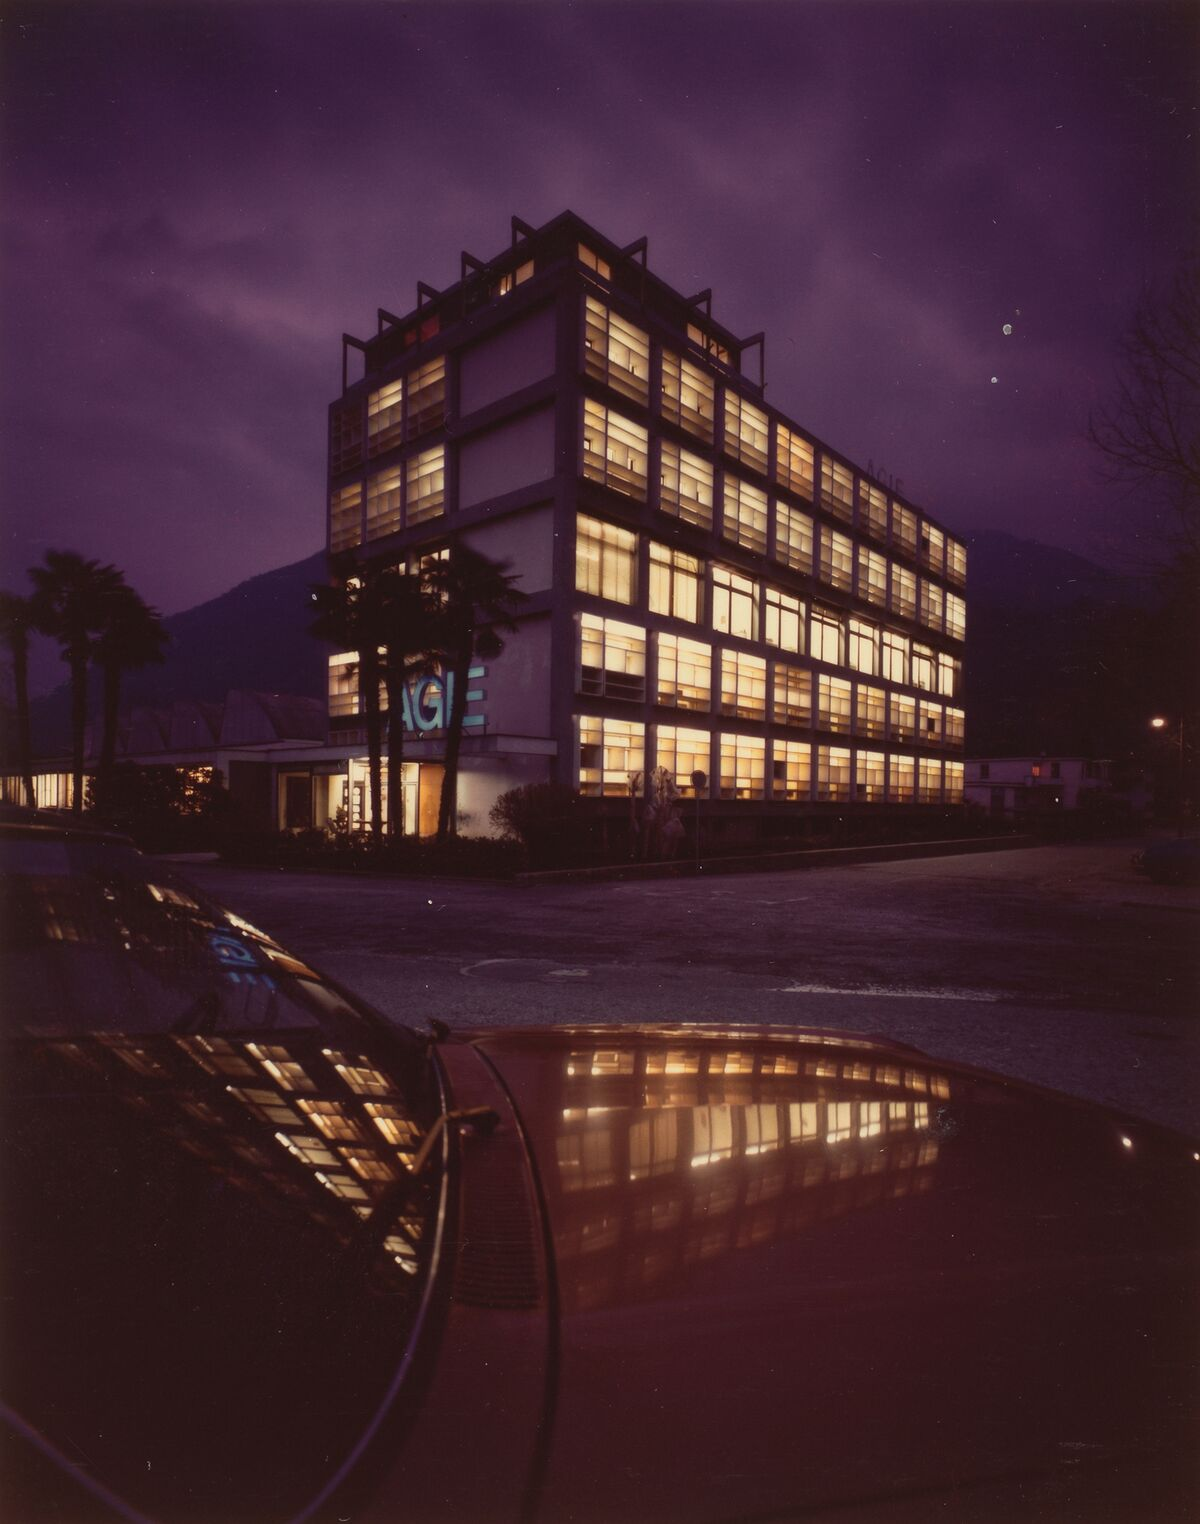 GFA 42/62243: AGIE administration building